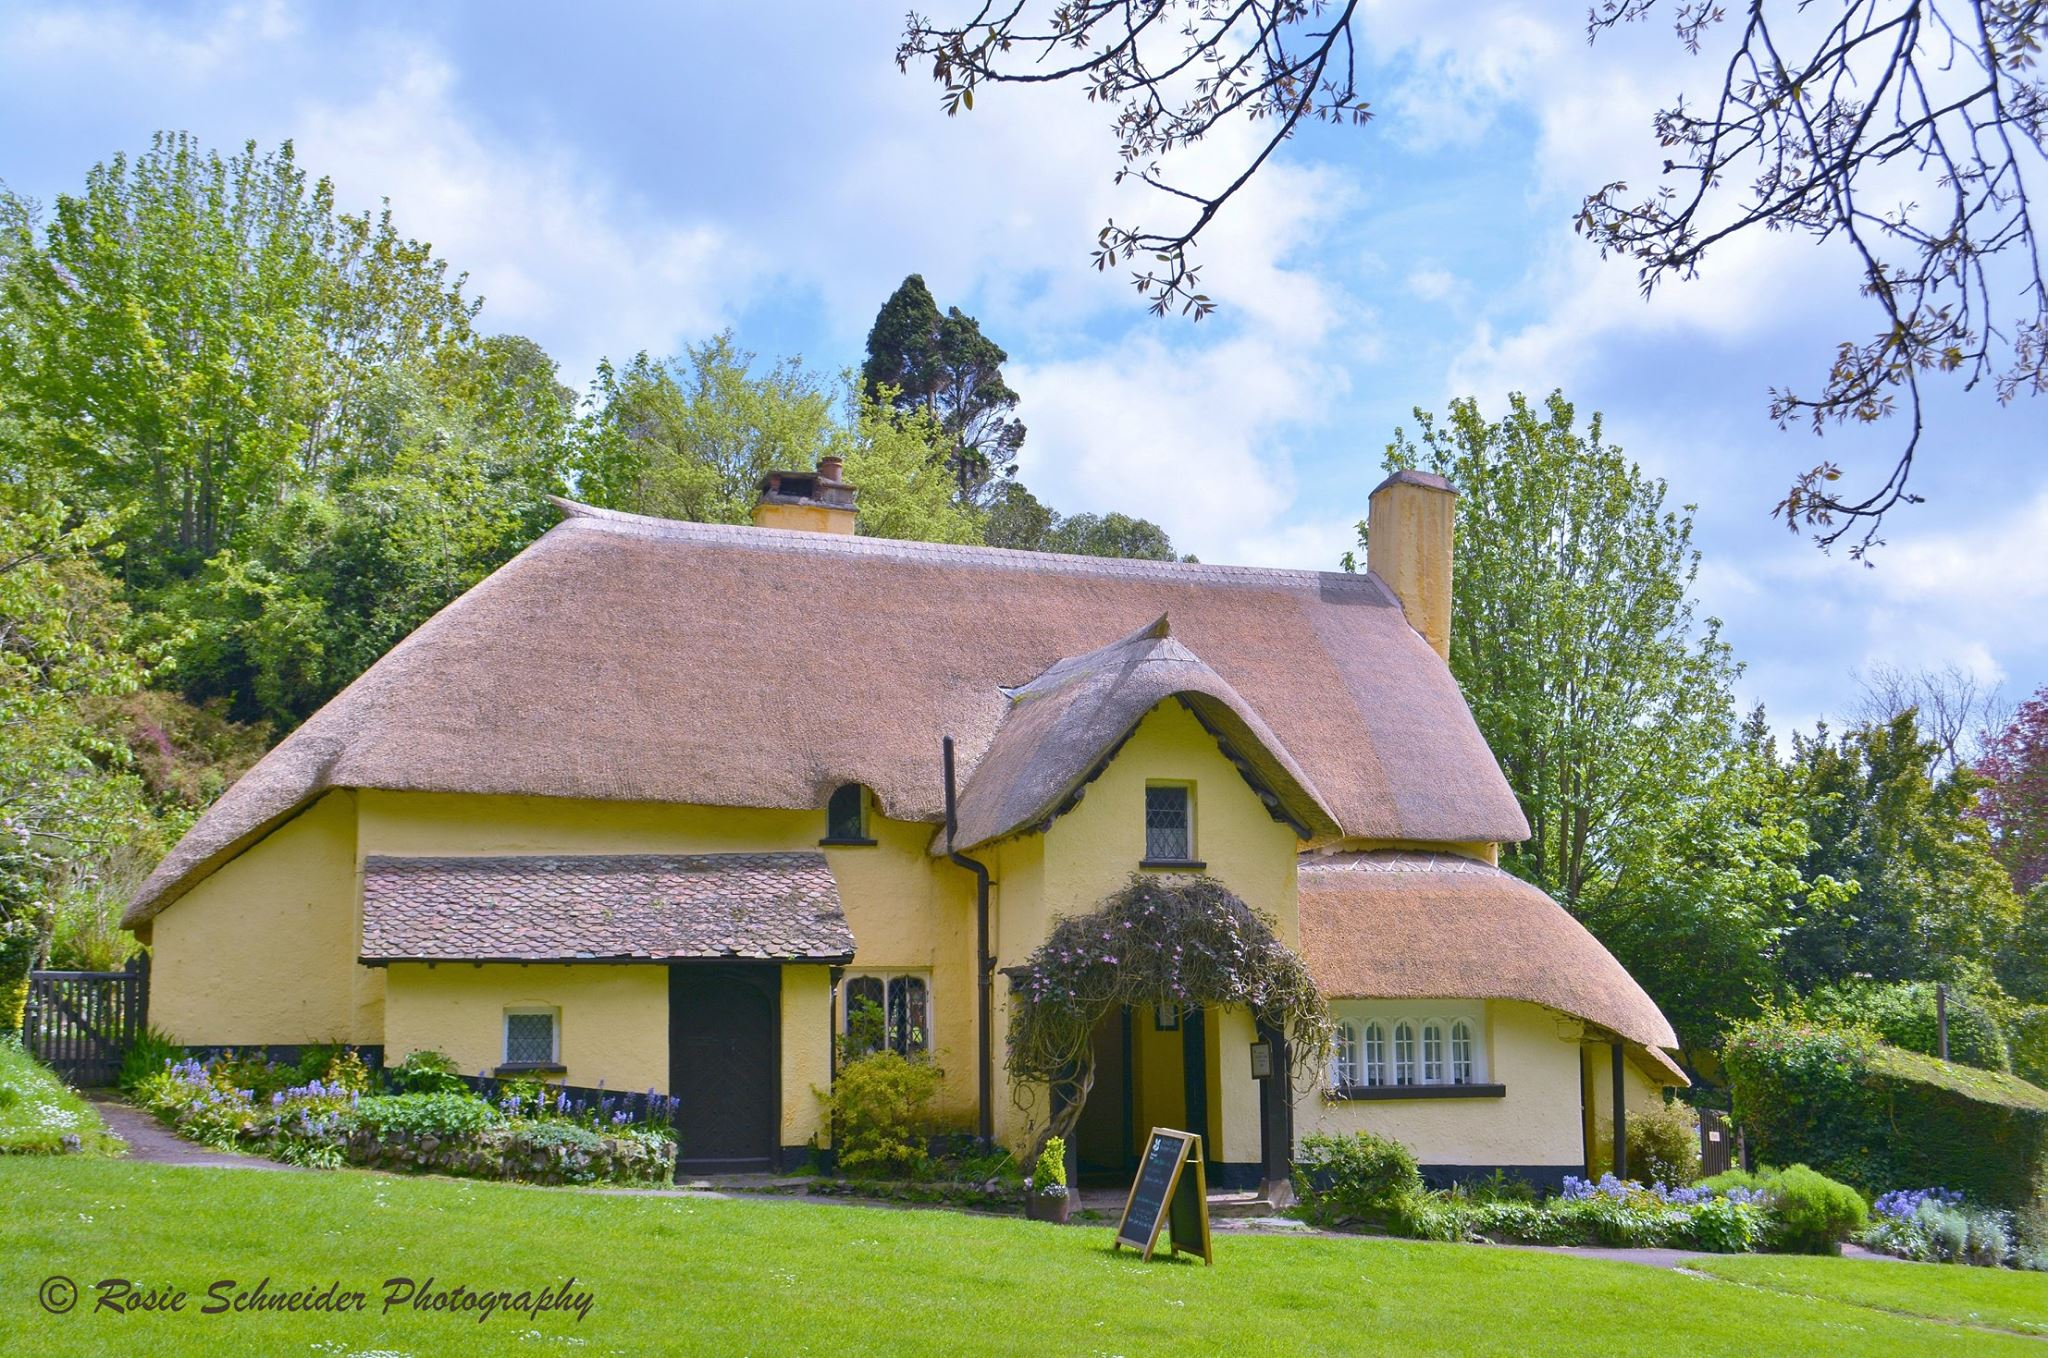 National Trust Selworthy Tearoom. Photo by Rosie Schneider